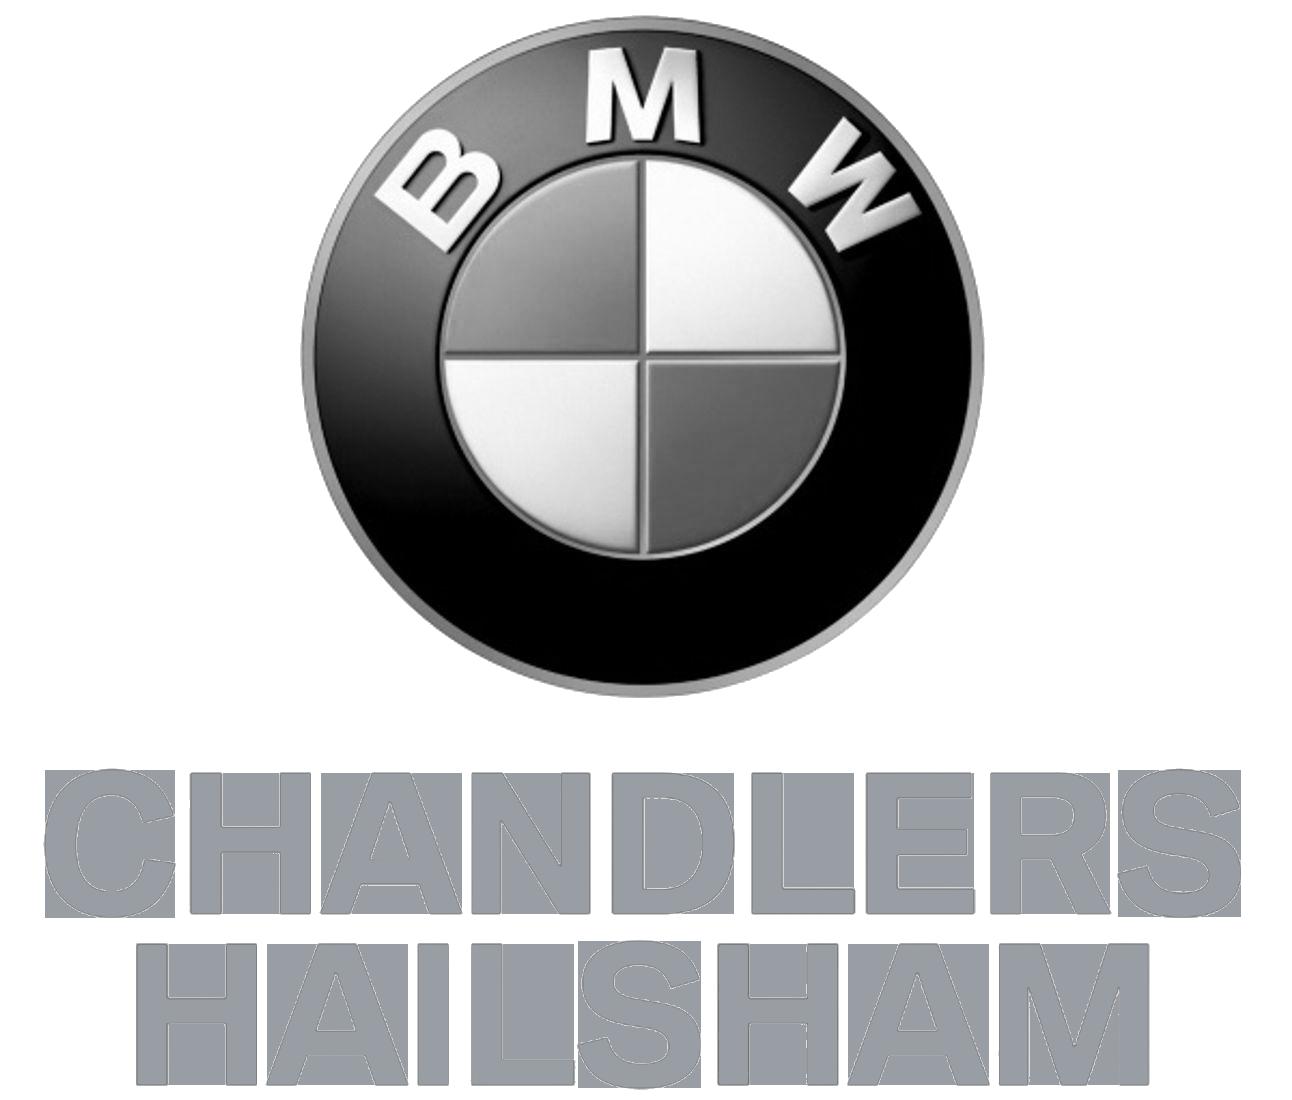 BMW Chandlers Hailsham logo